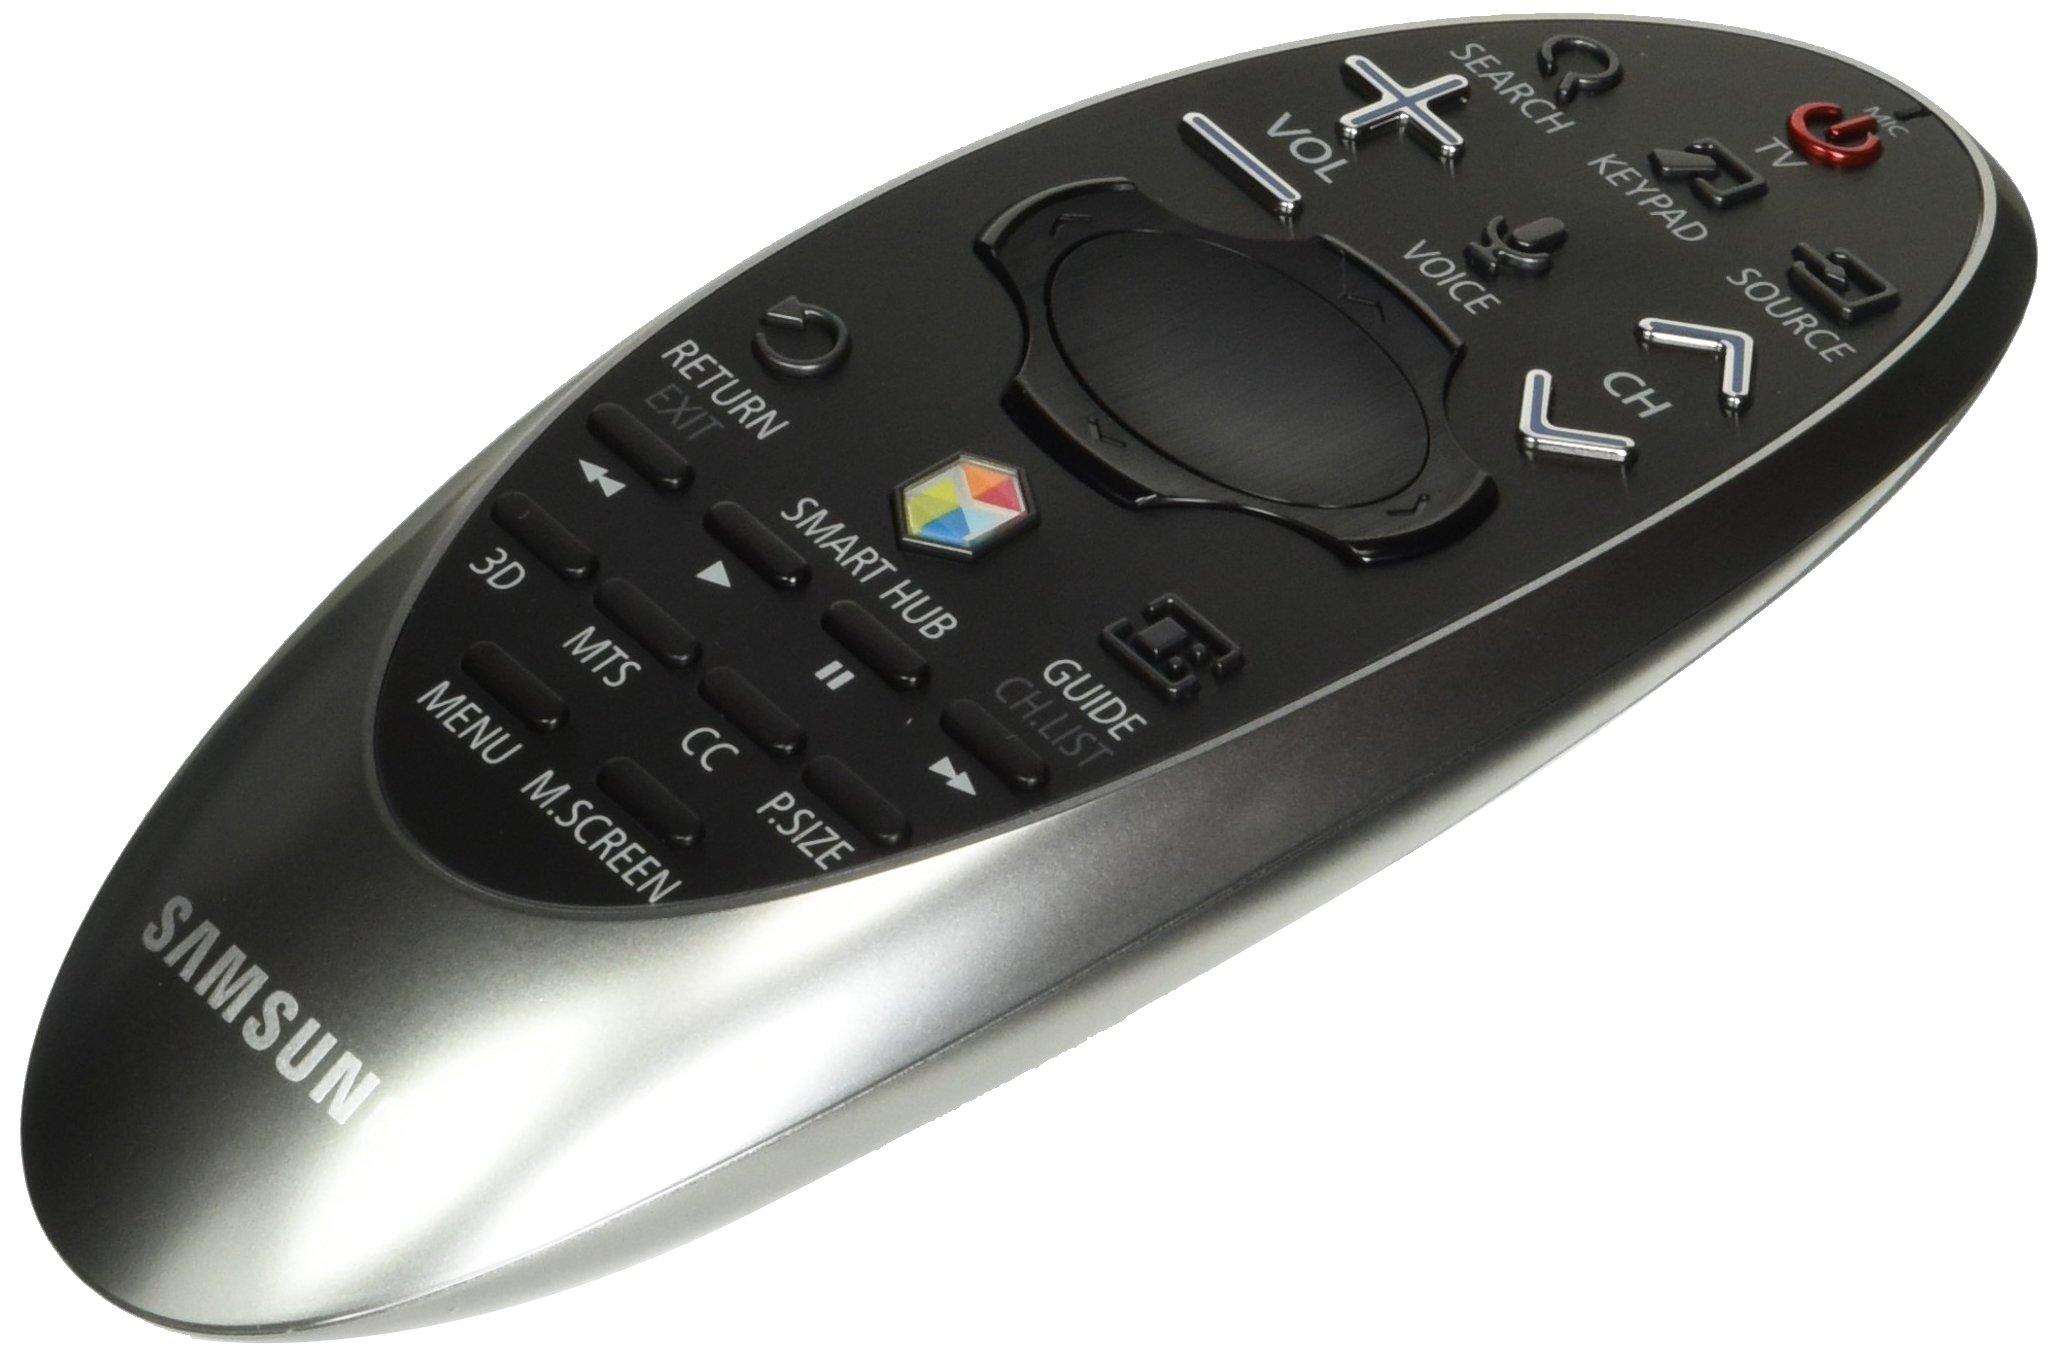 Samsung BN59-01181A Remote Control